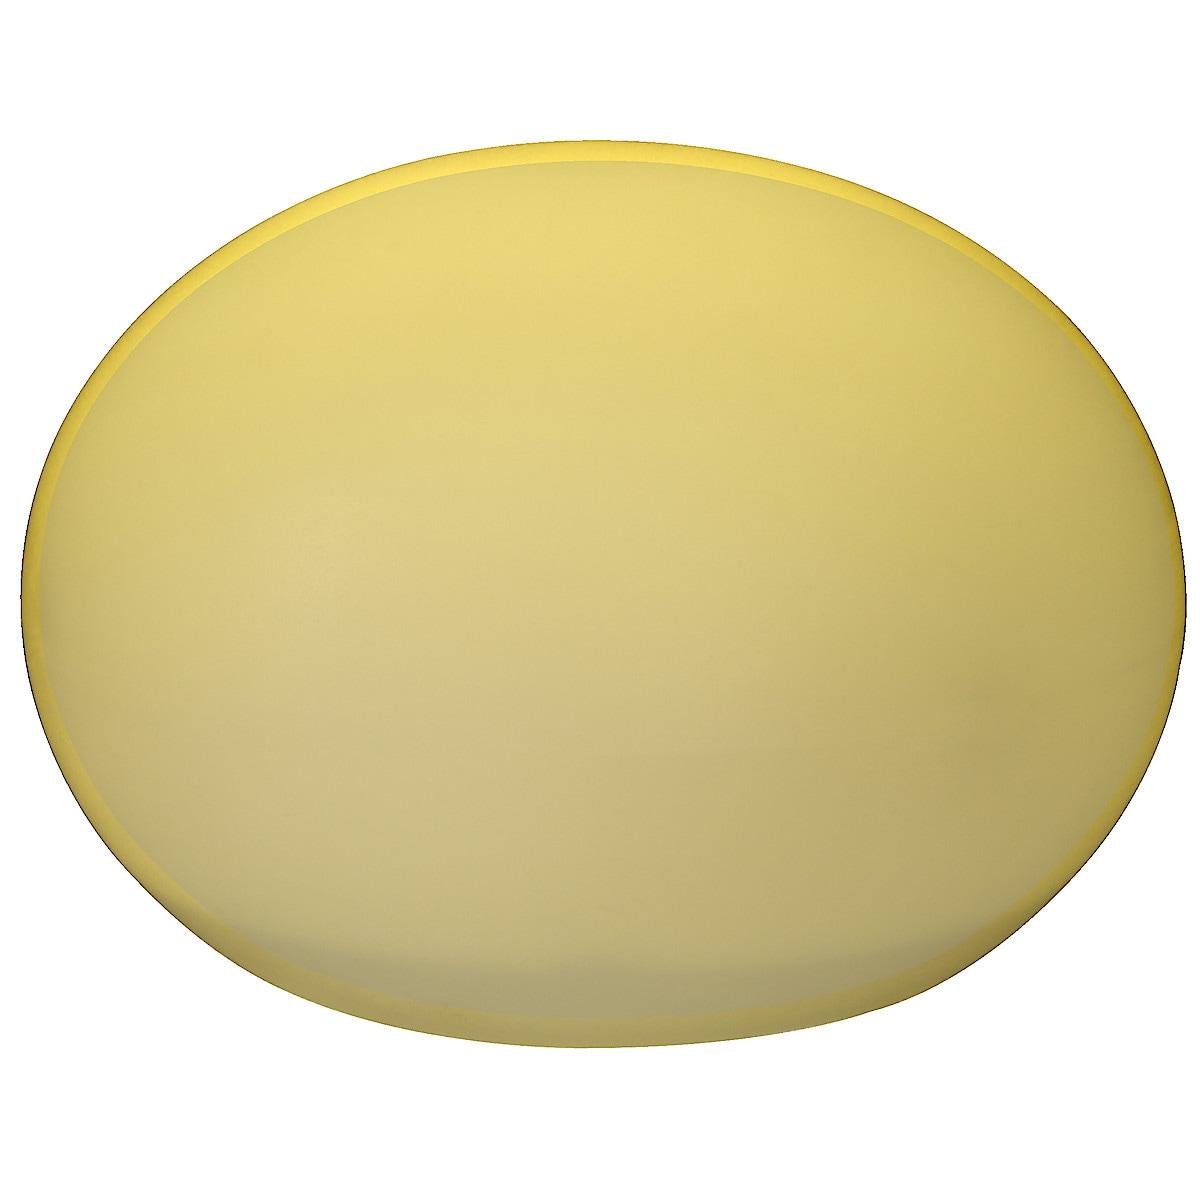 Solcellslampa rund